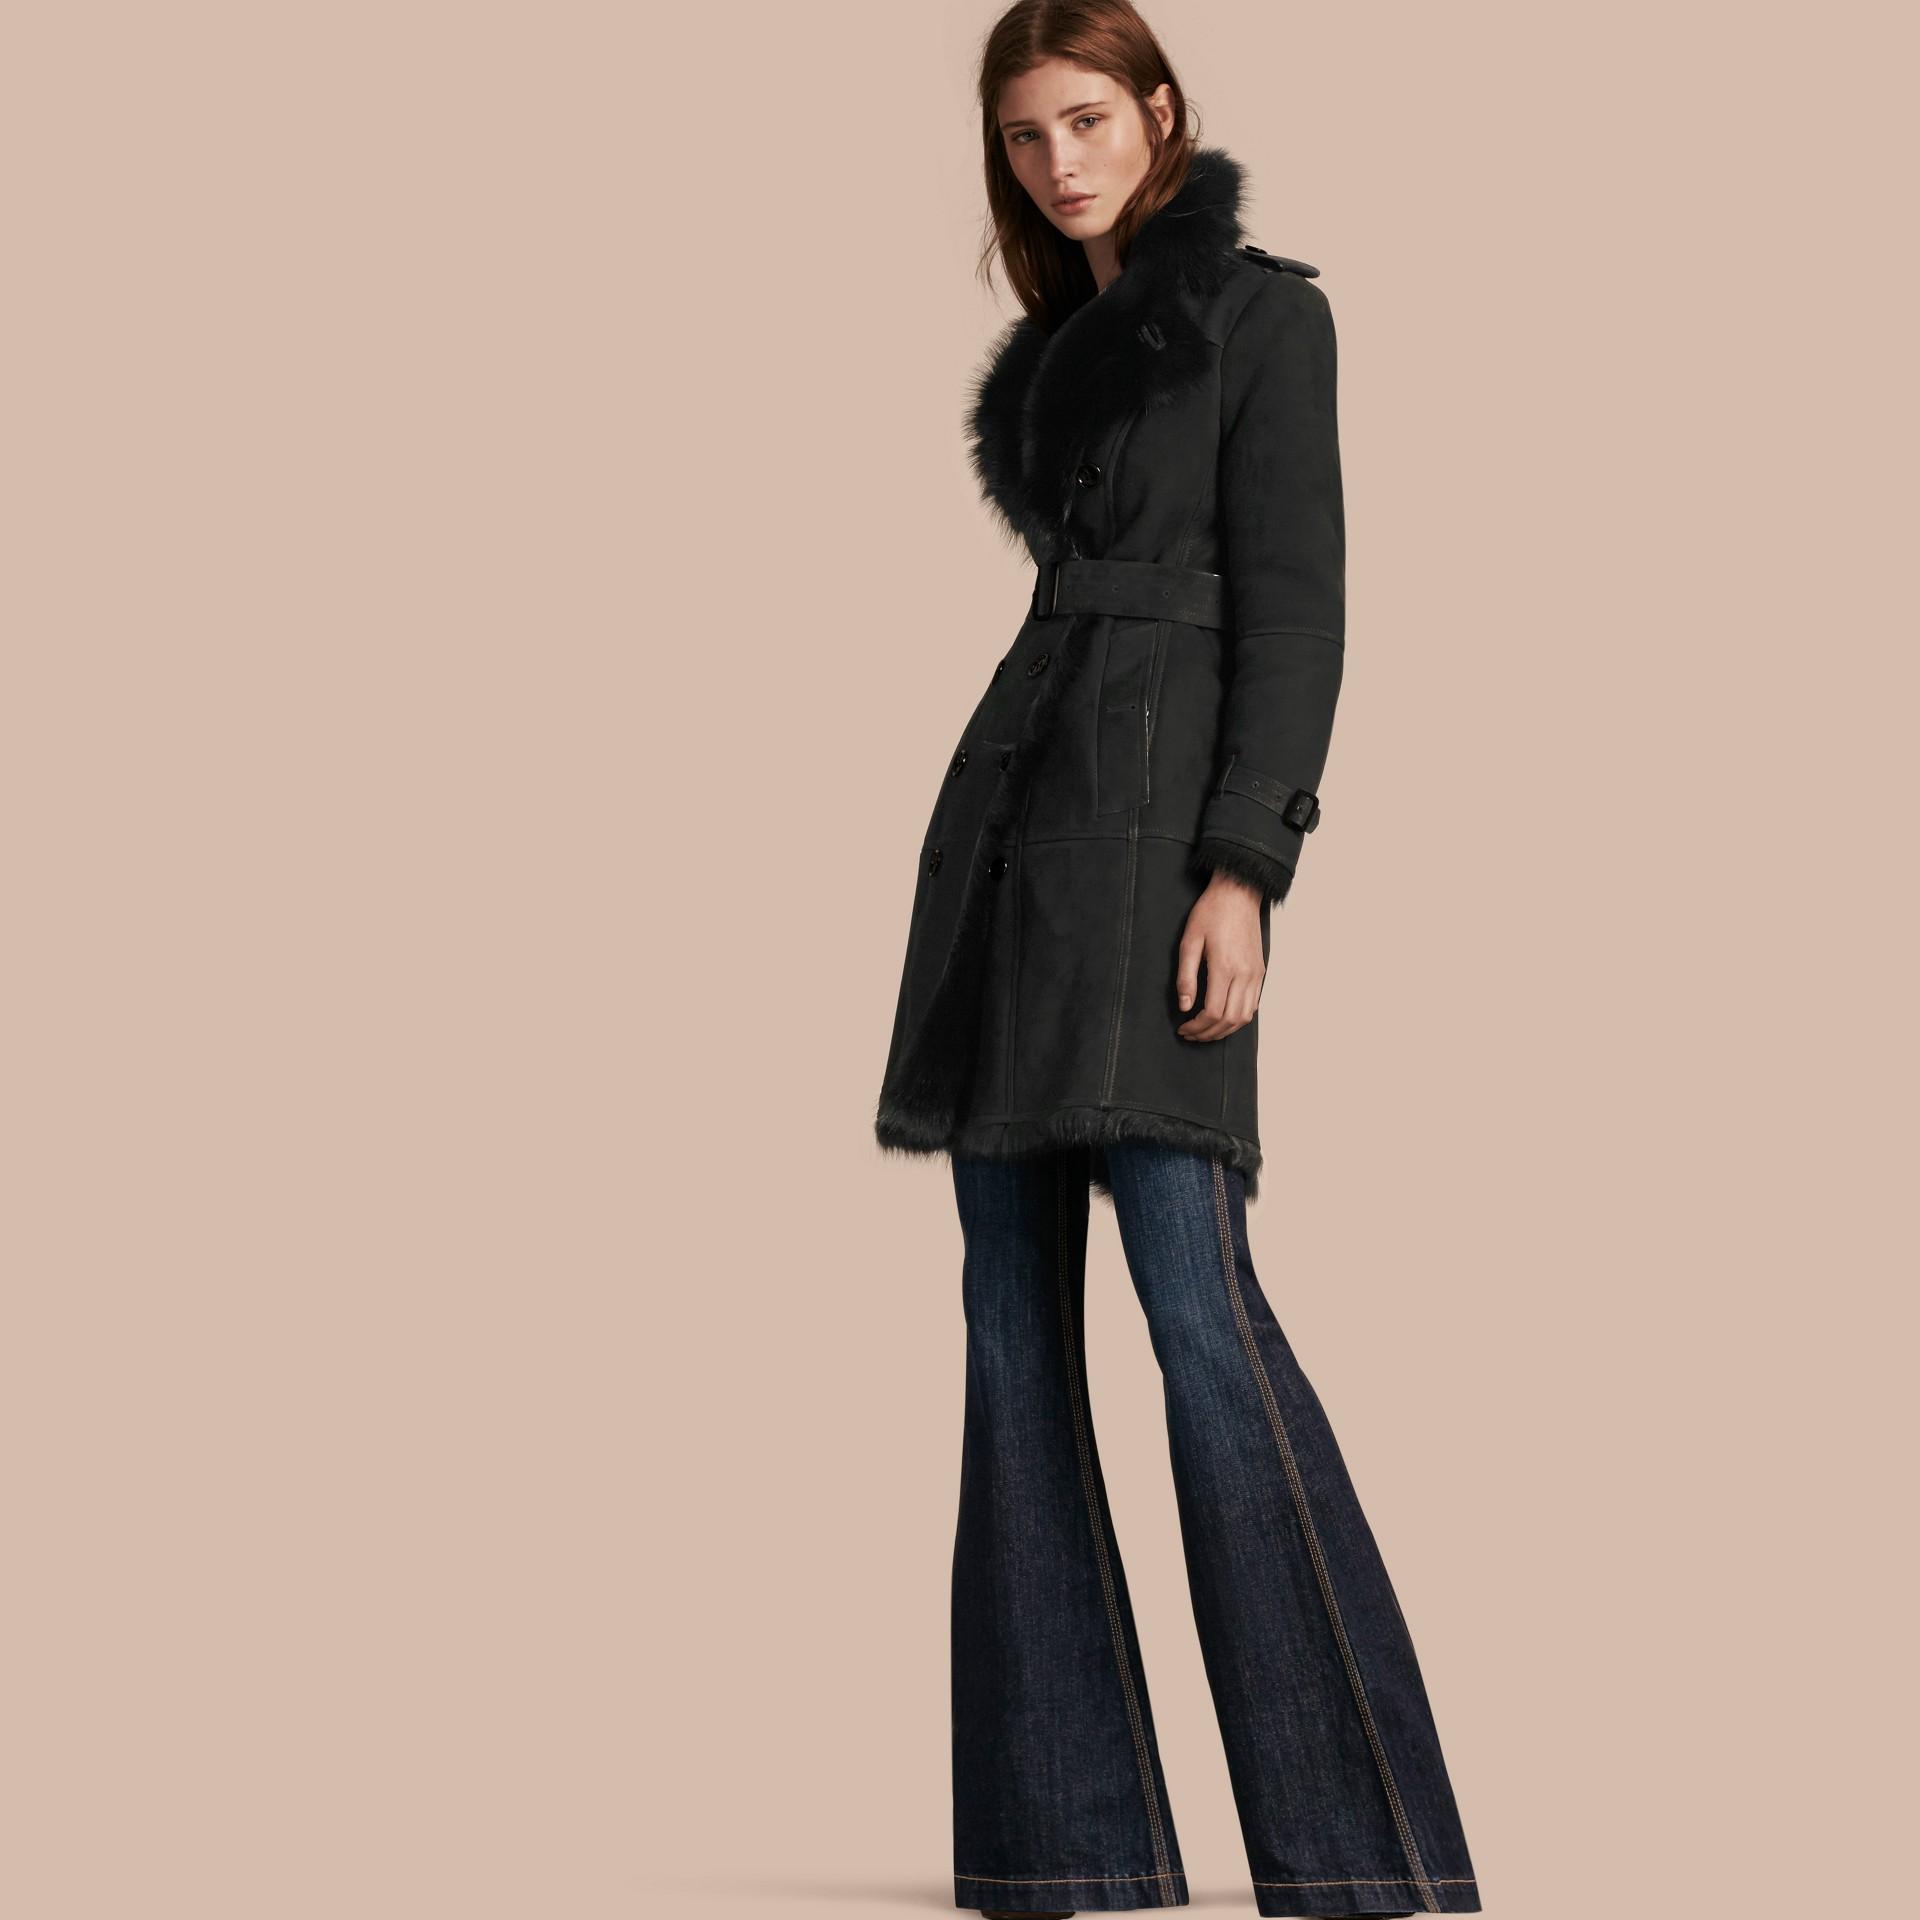 Noir Trench-coat en shearling Noir - photo de la galerie 1